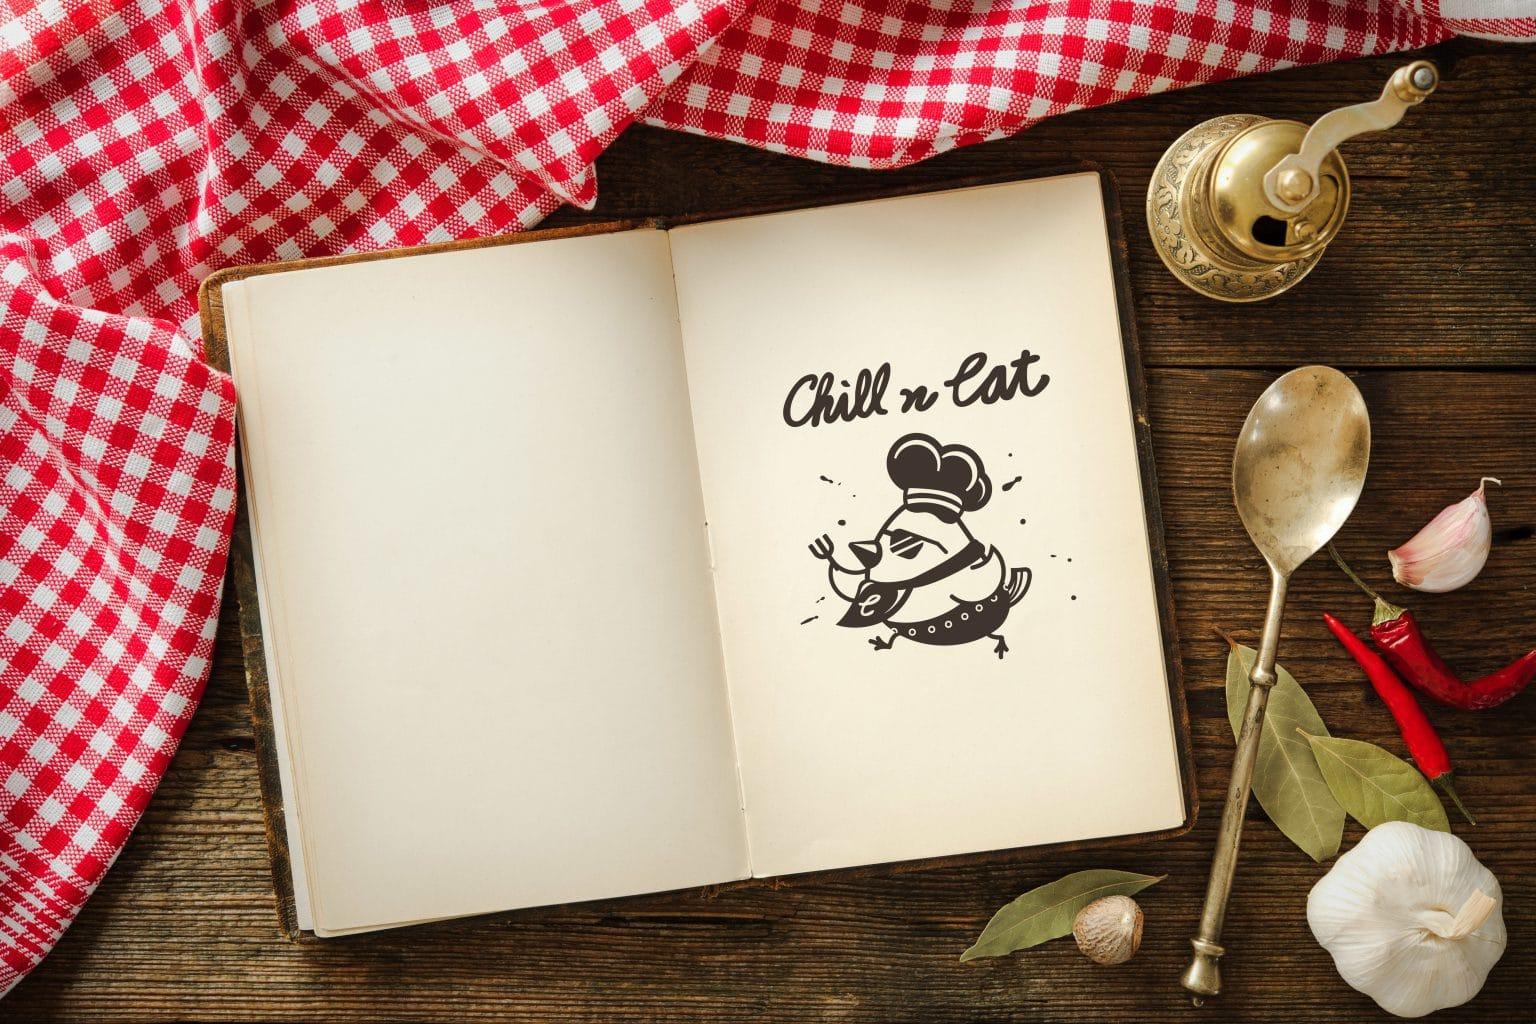 CHILL N EAT鹽水雞 LOGO設計 形象設計 品牌設計 商標設計